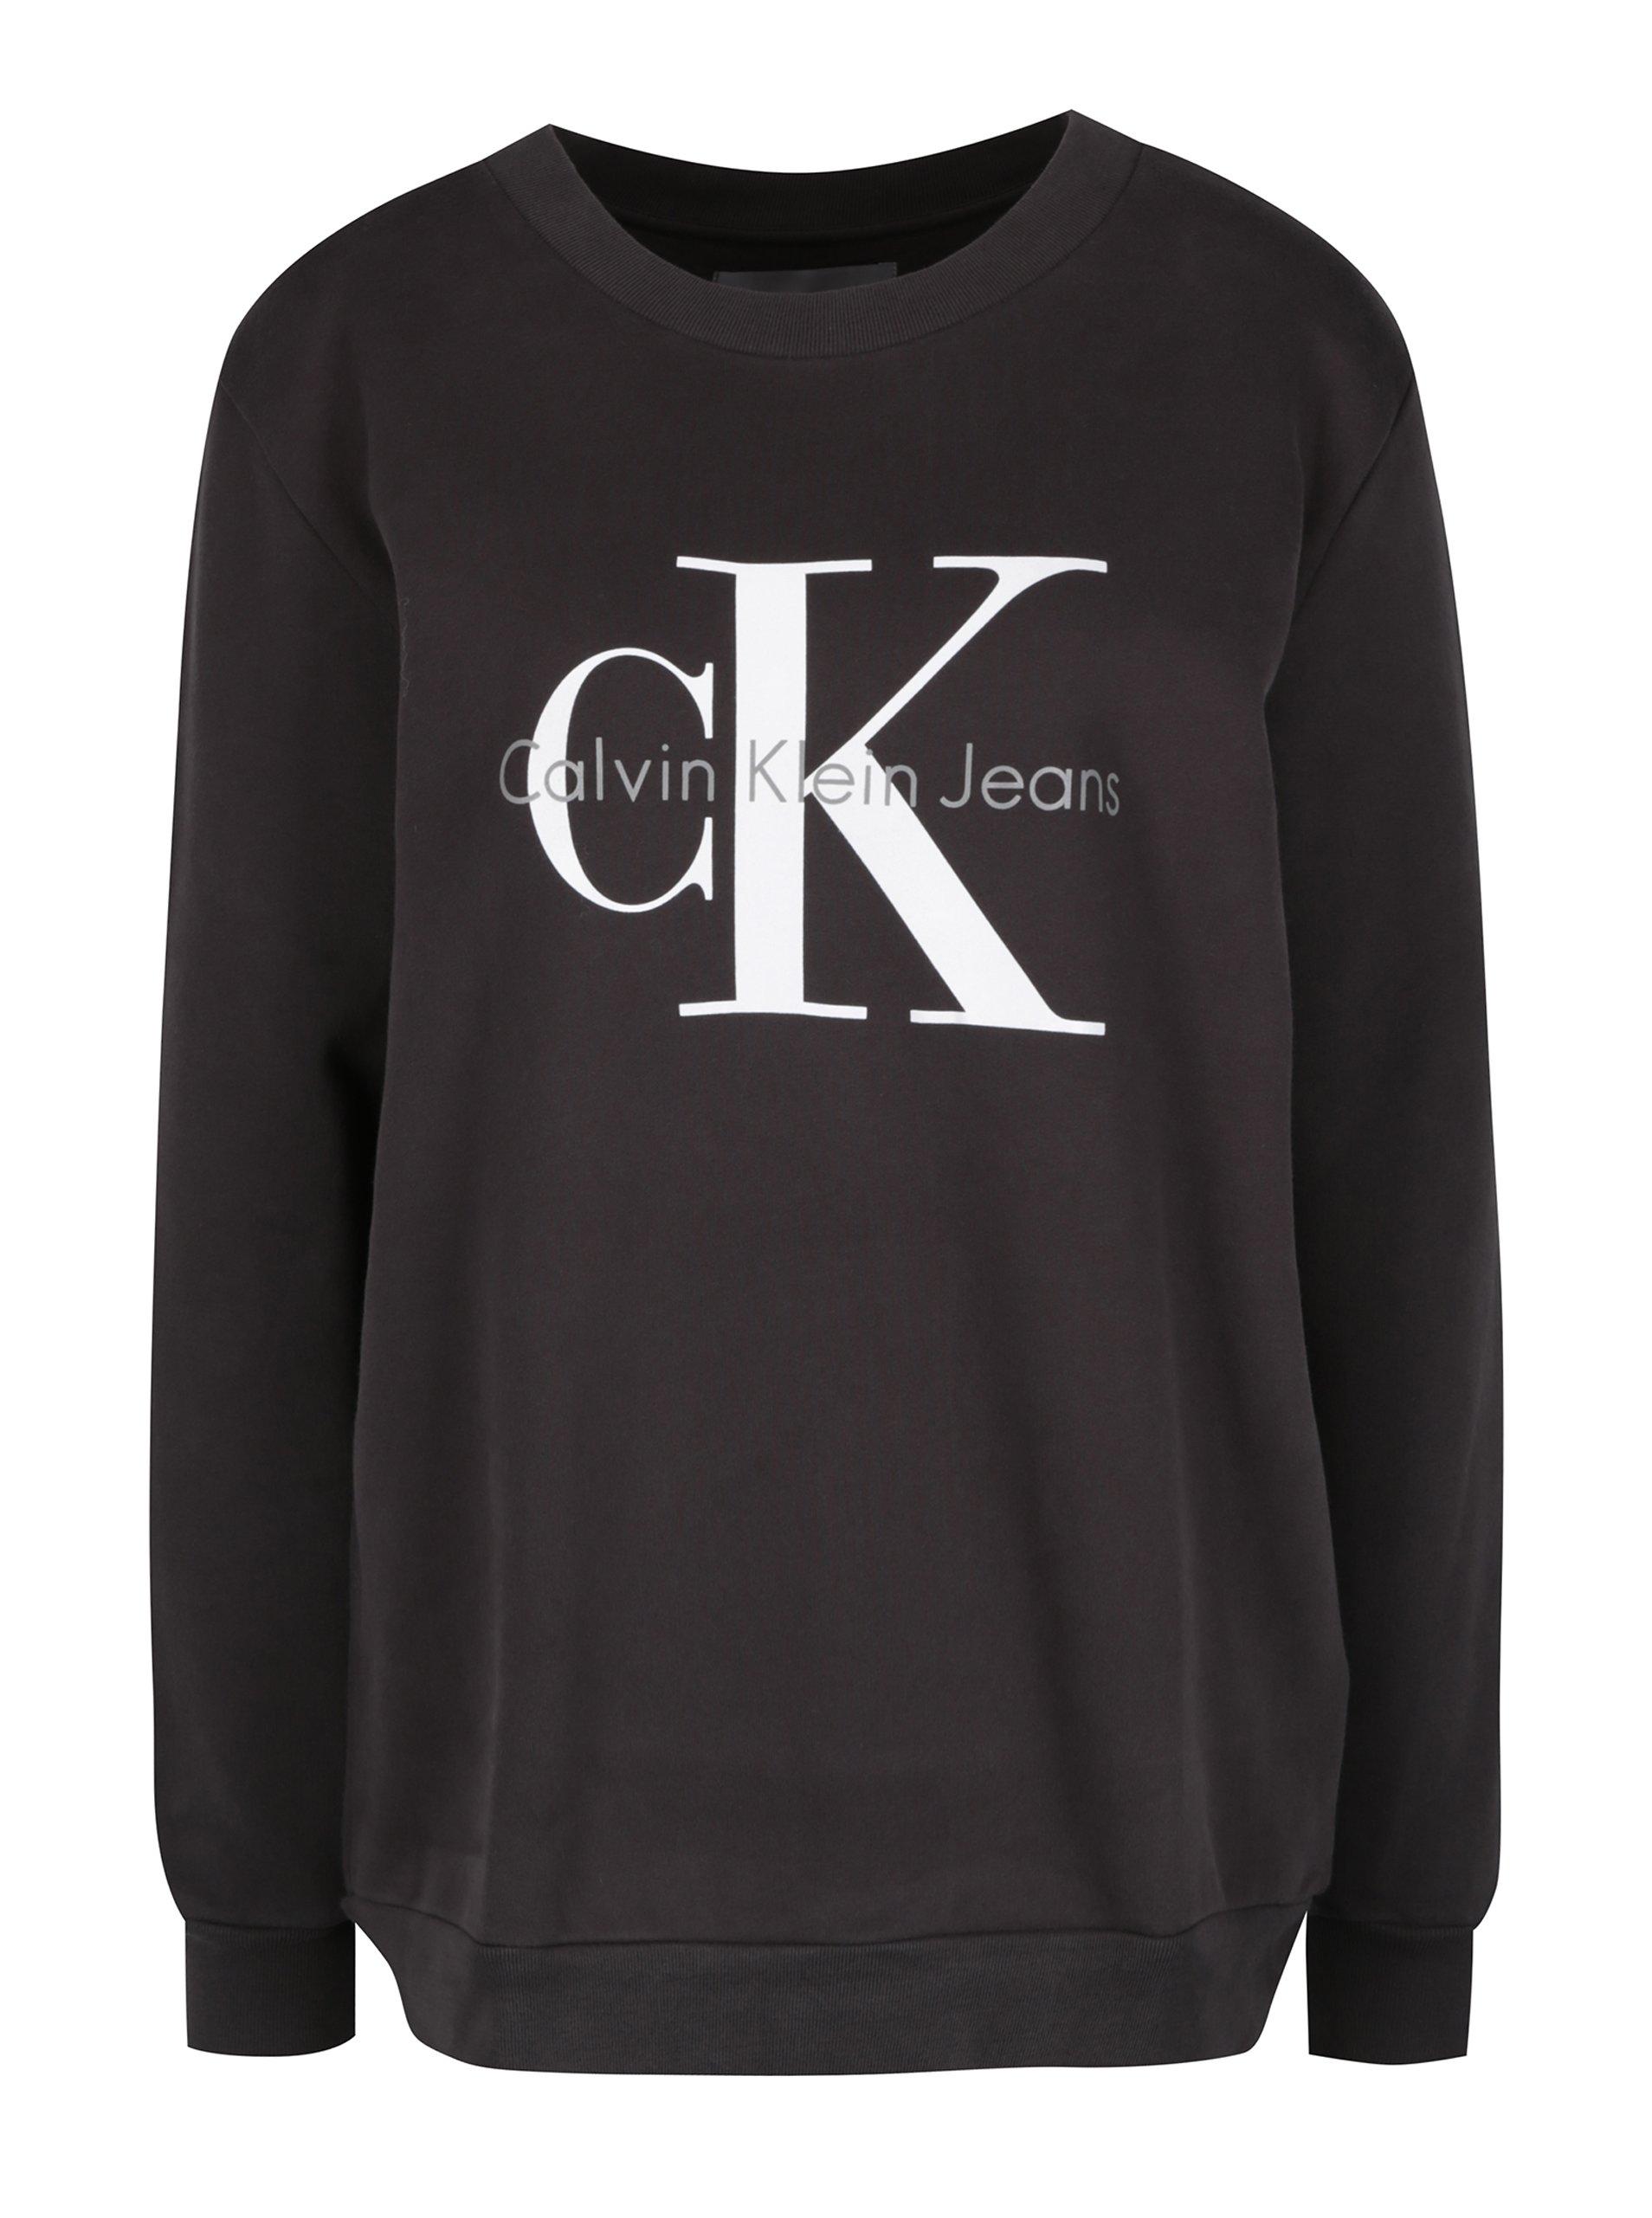 3676269c7ae5b Tmavosivá dámska mikina s potlačou Calvin Klein Jeans Crew | Moda.sk